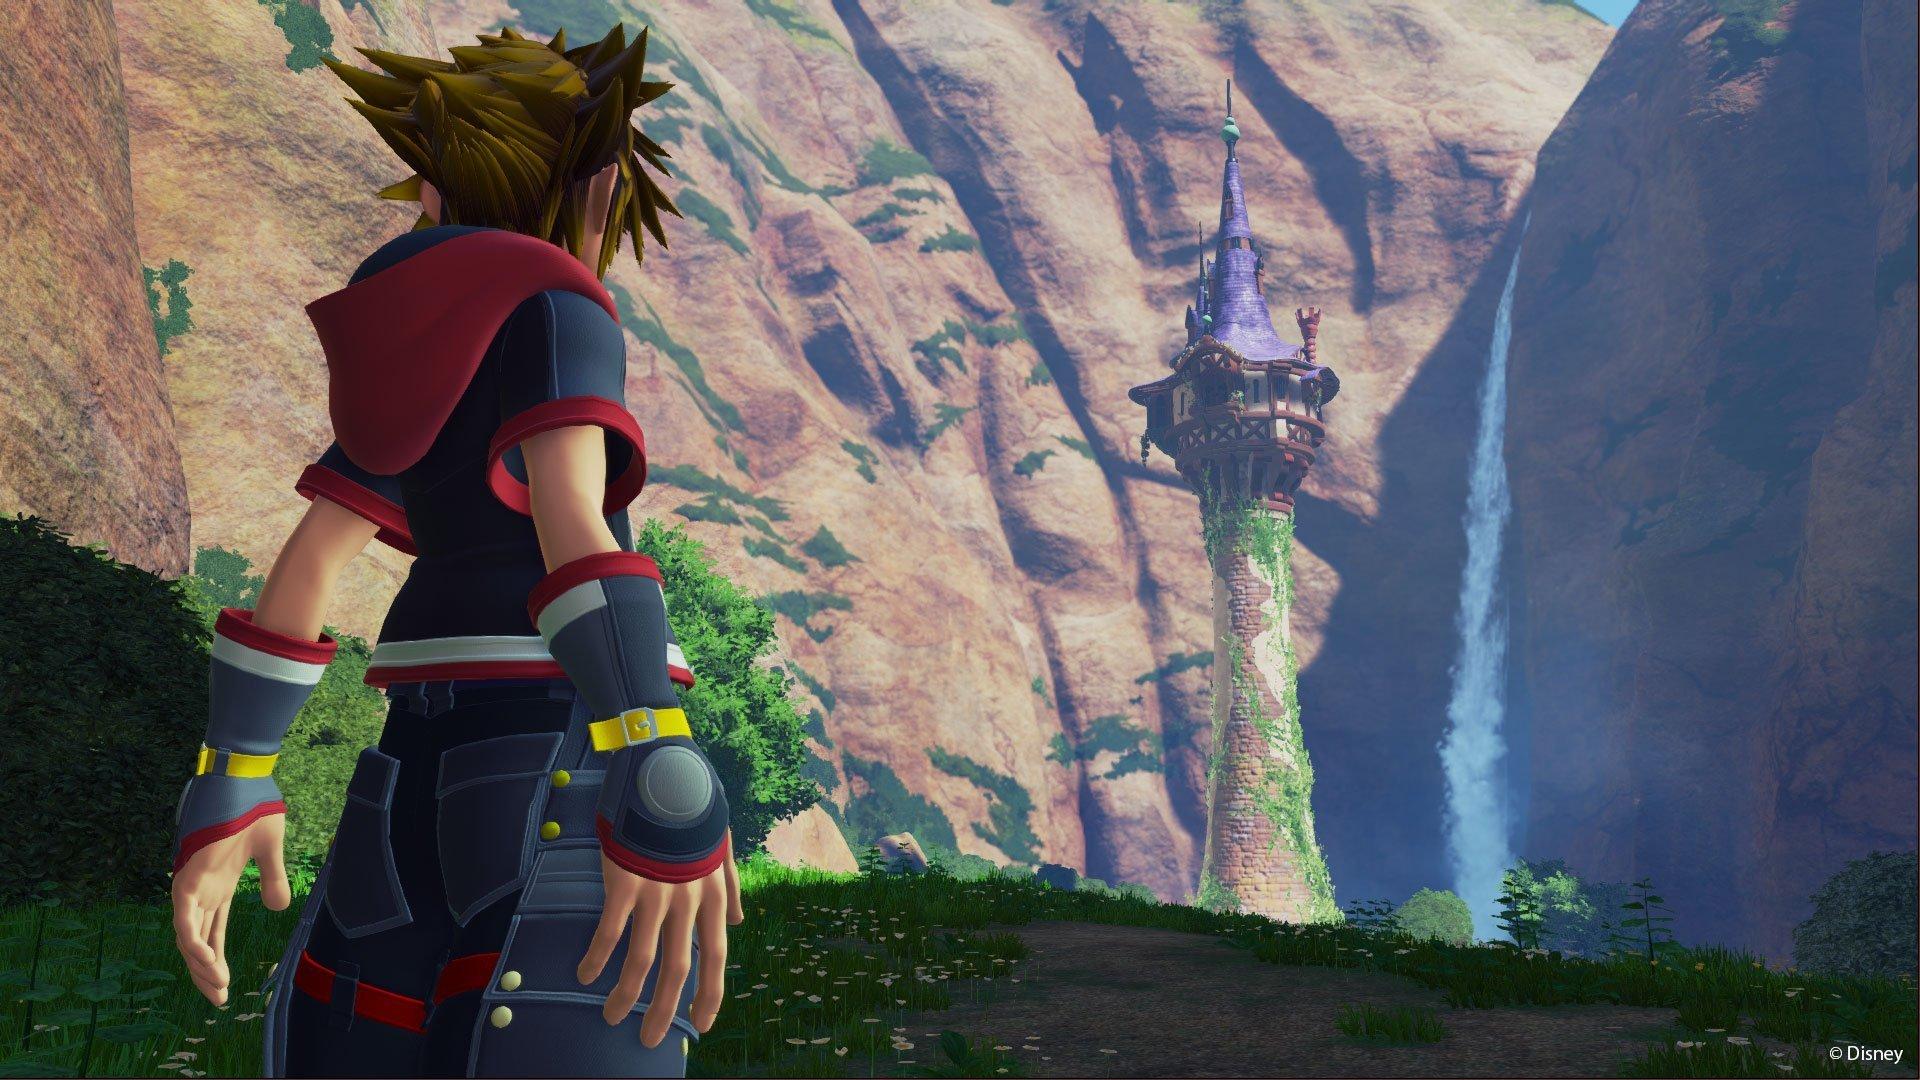 Sora looks out at Rapunzel's castle in Kingdom Hearts III.